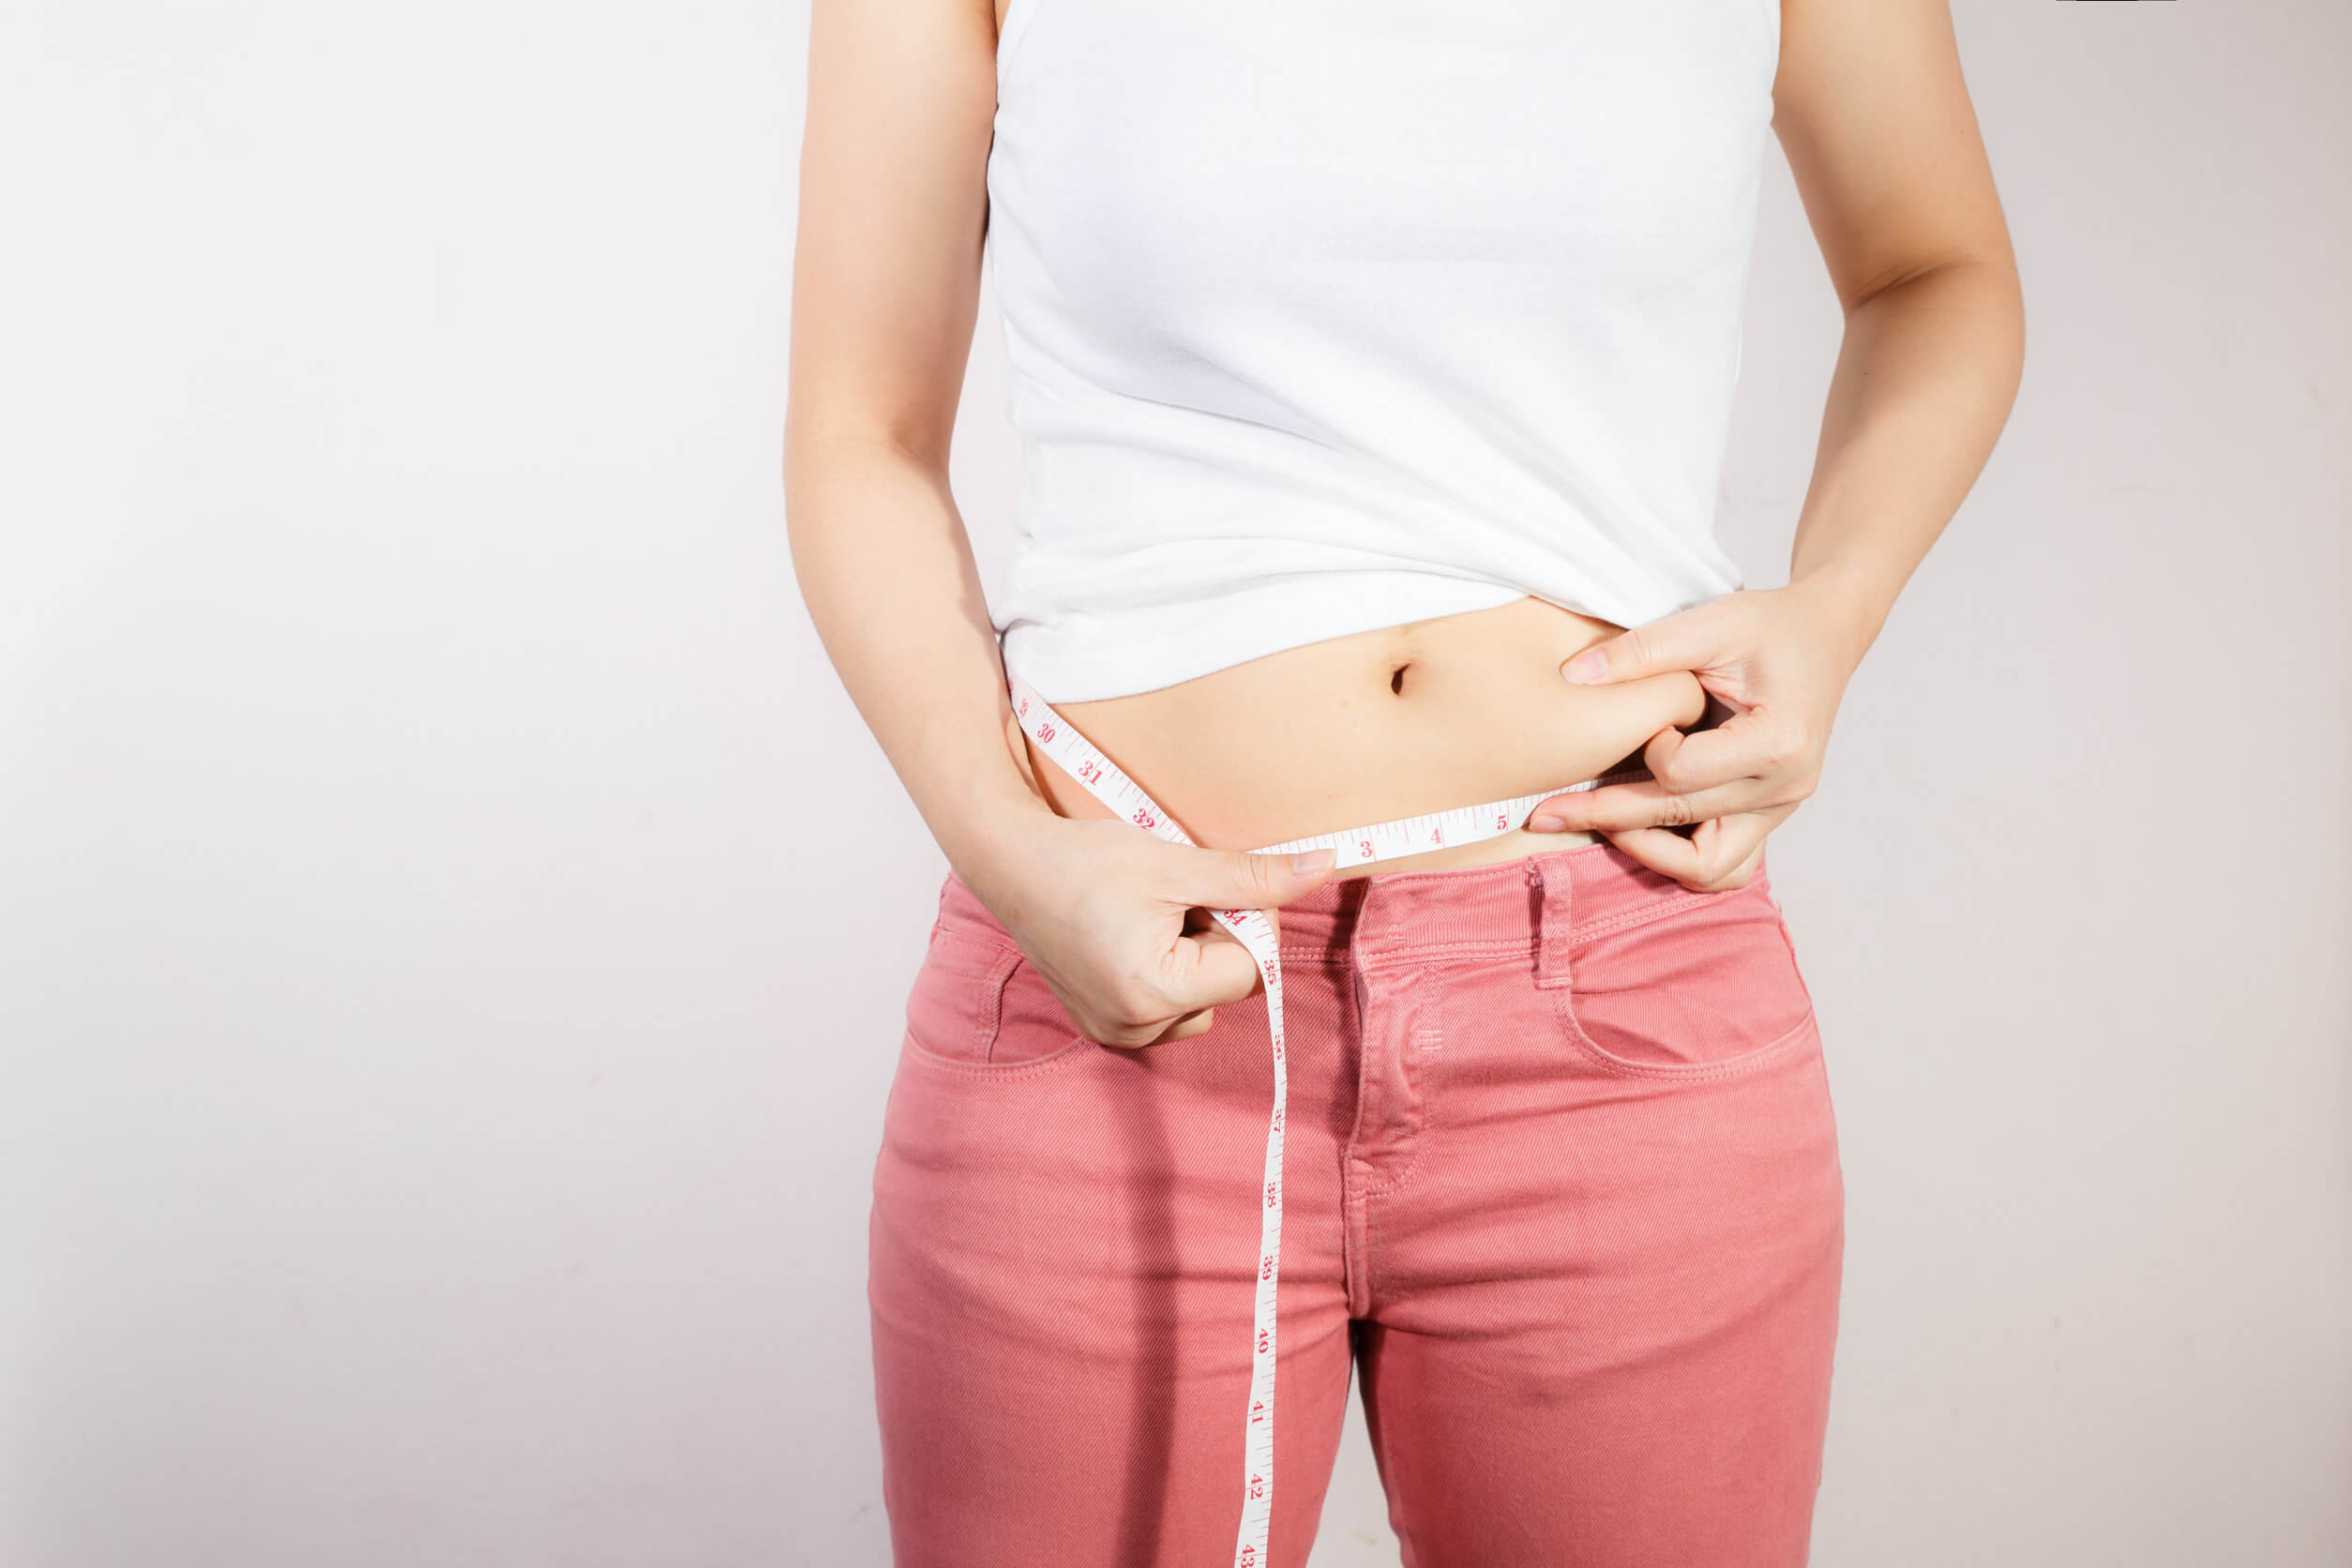 Plan de tres días para reducir la cintura